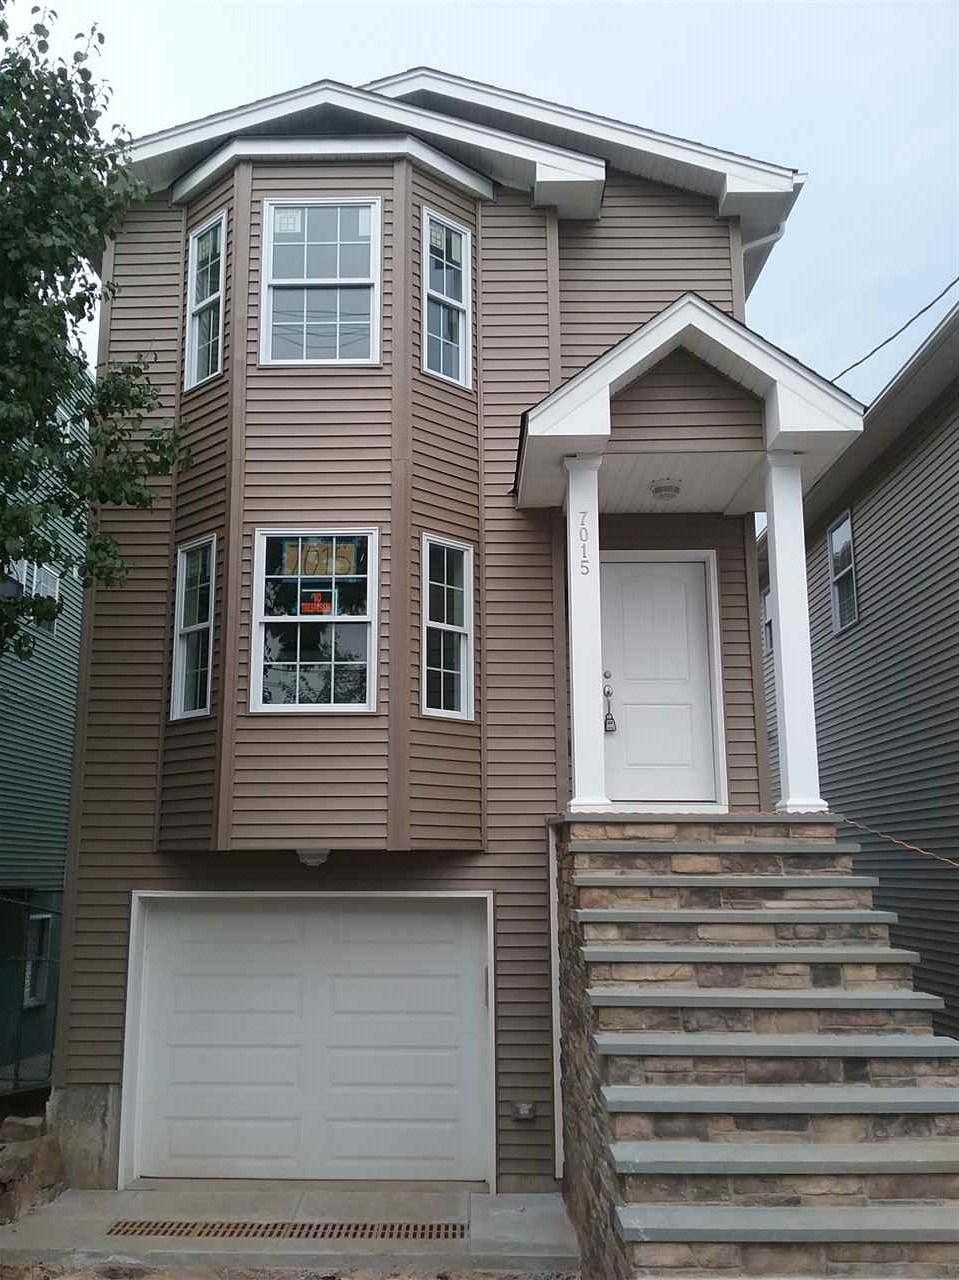 7017 SMITH AVE, North Bergen, NJ 07047